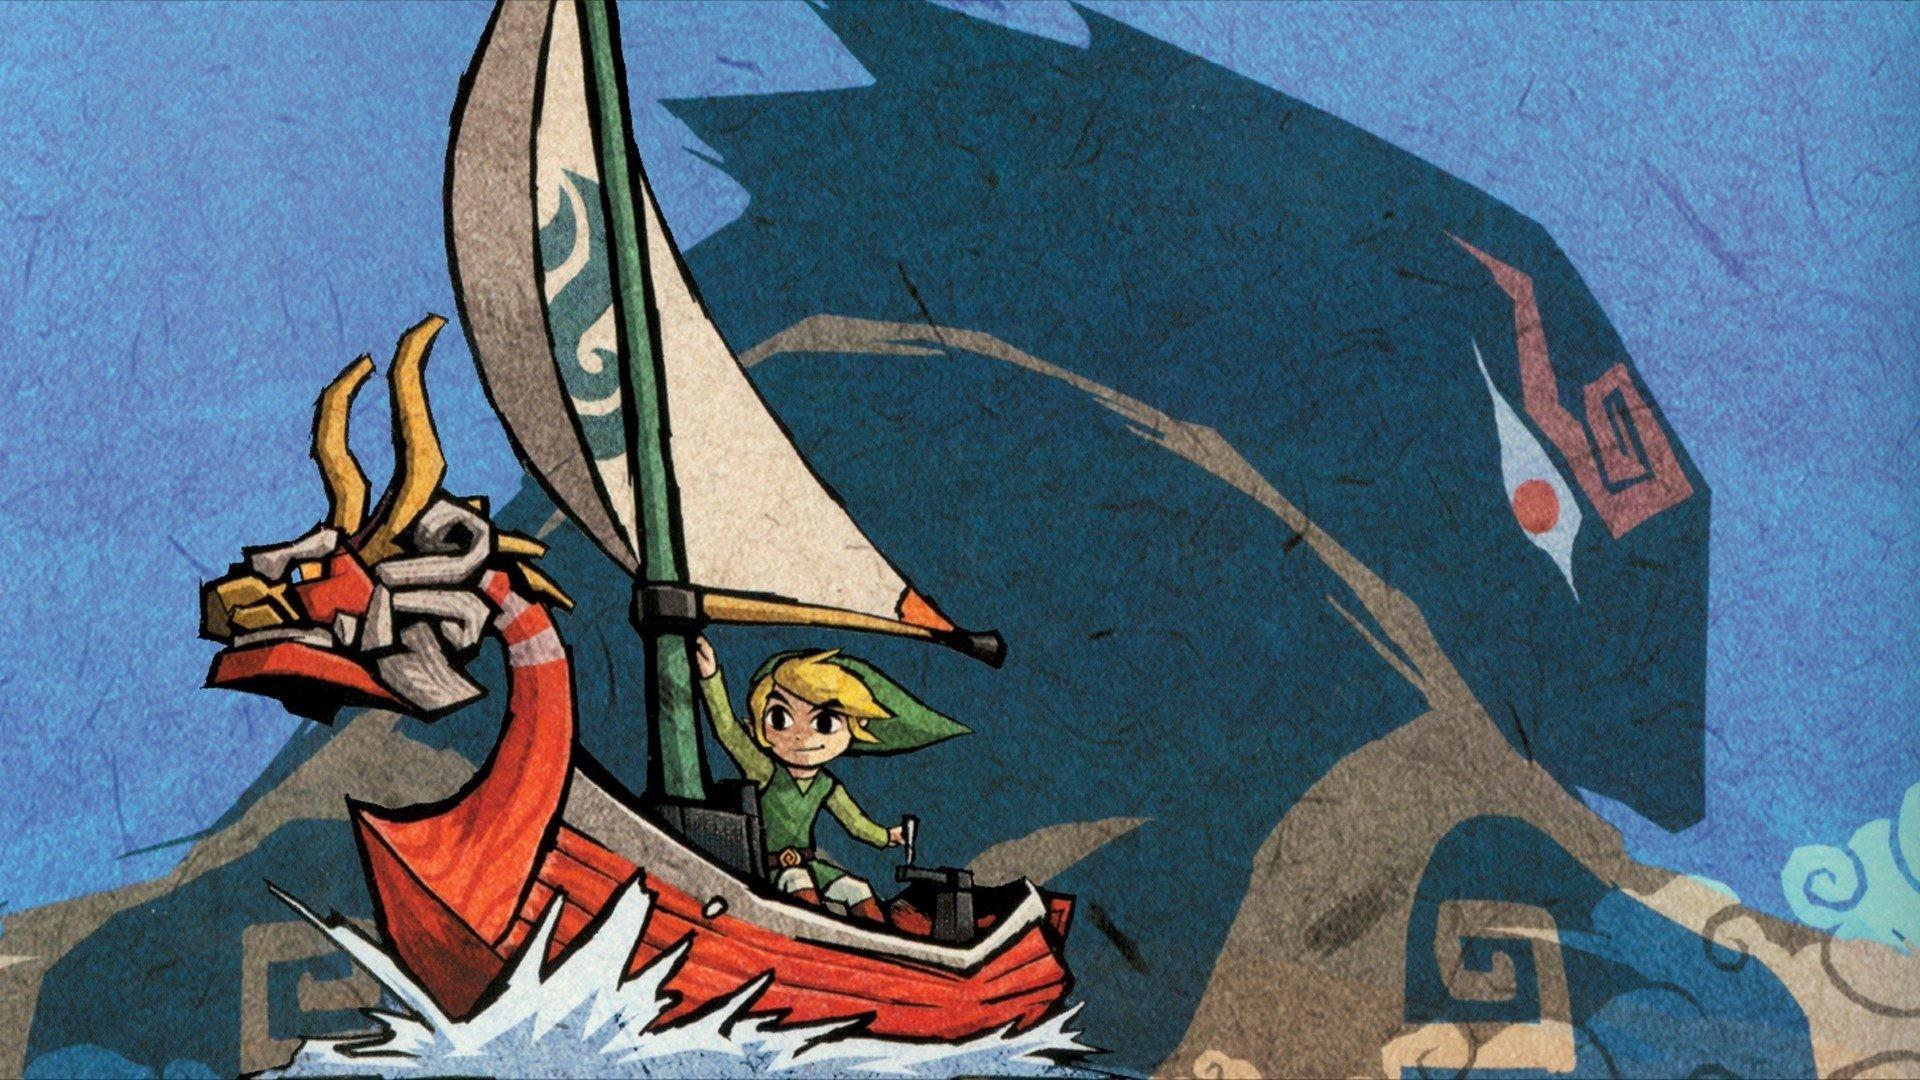 the legend of zelda the wind waker game hd wallpaper 1920×1080 3980. ««